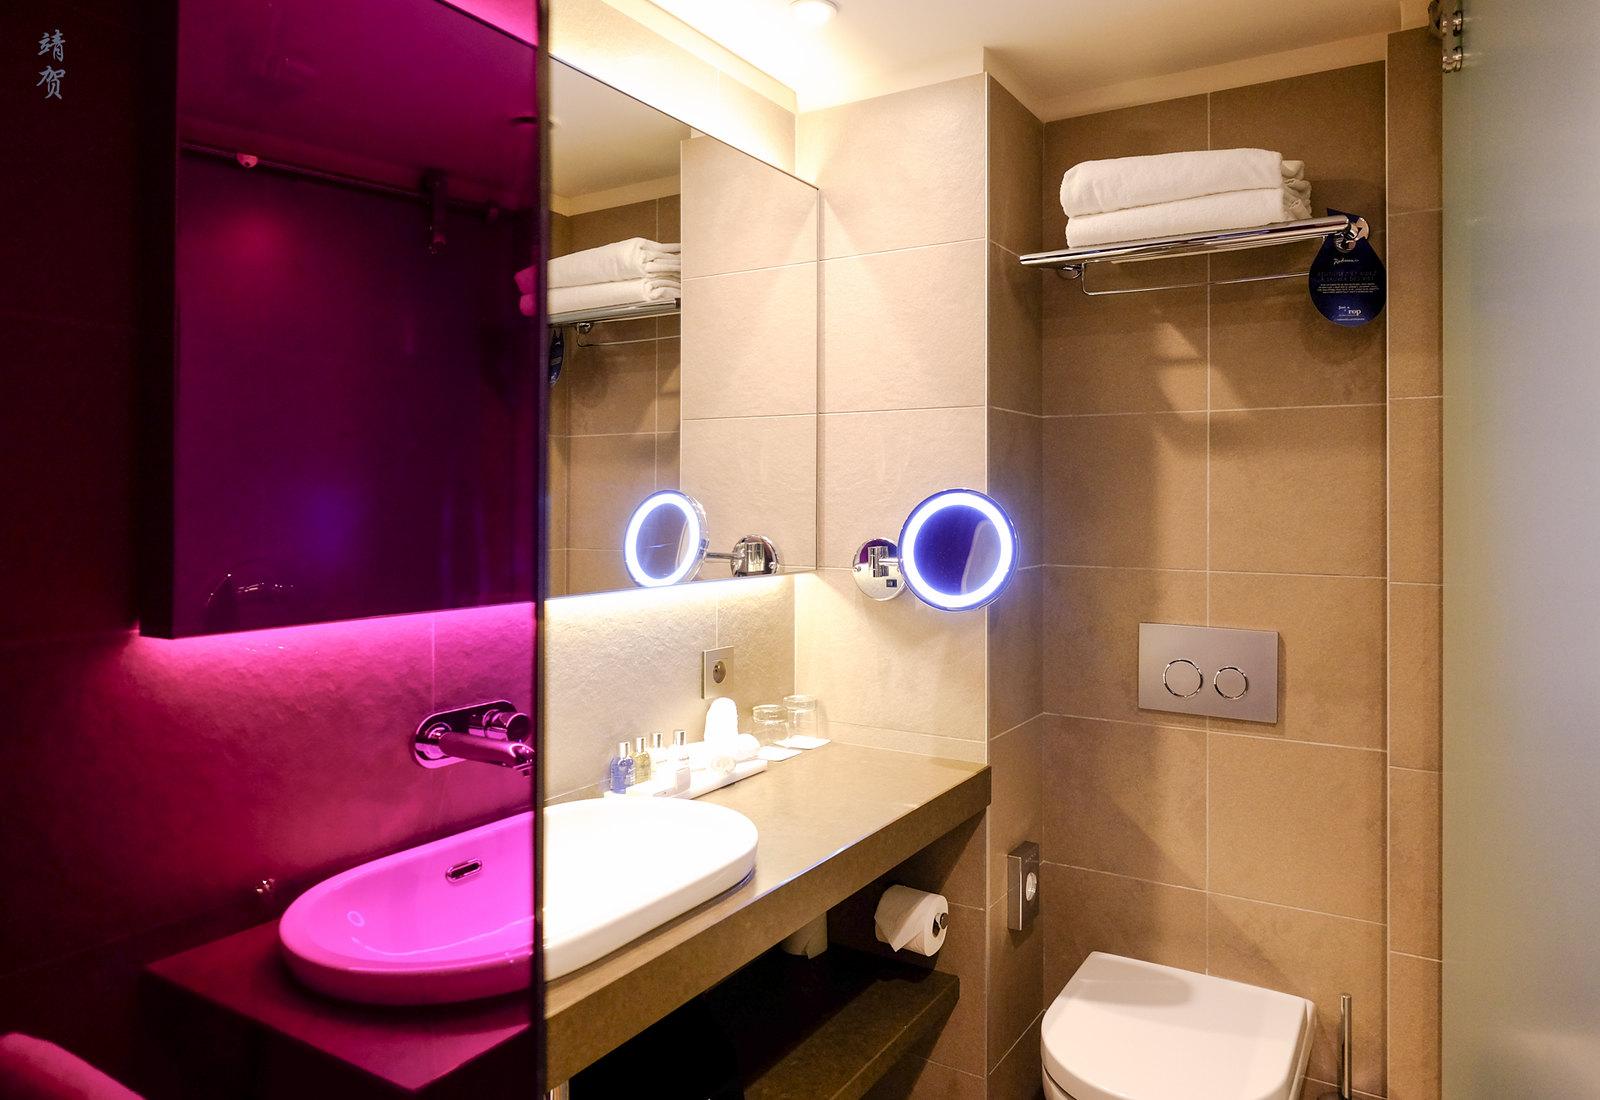 Panoramic room bathroom